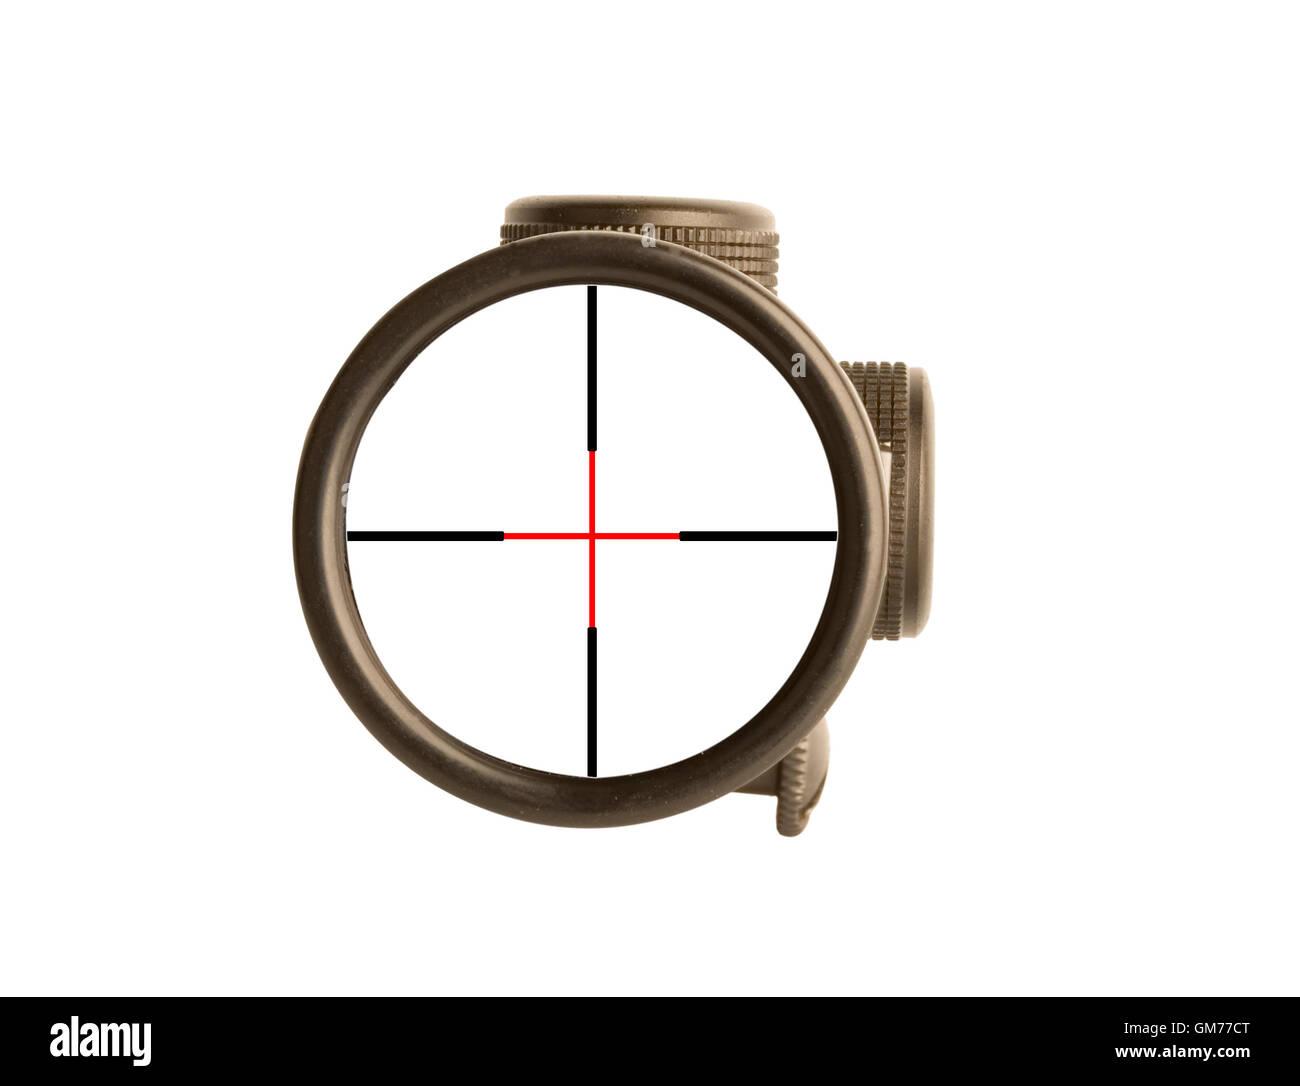 Icon concept rifle scope stock image - Stock Image